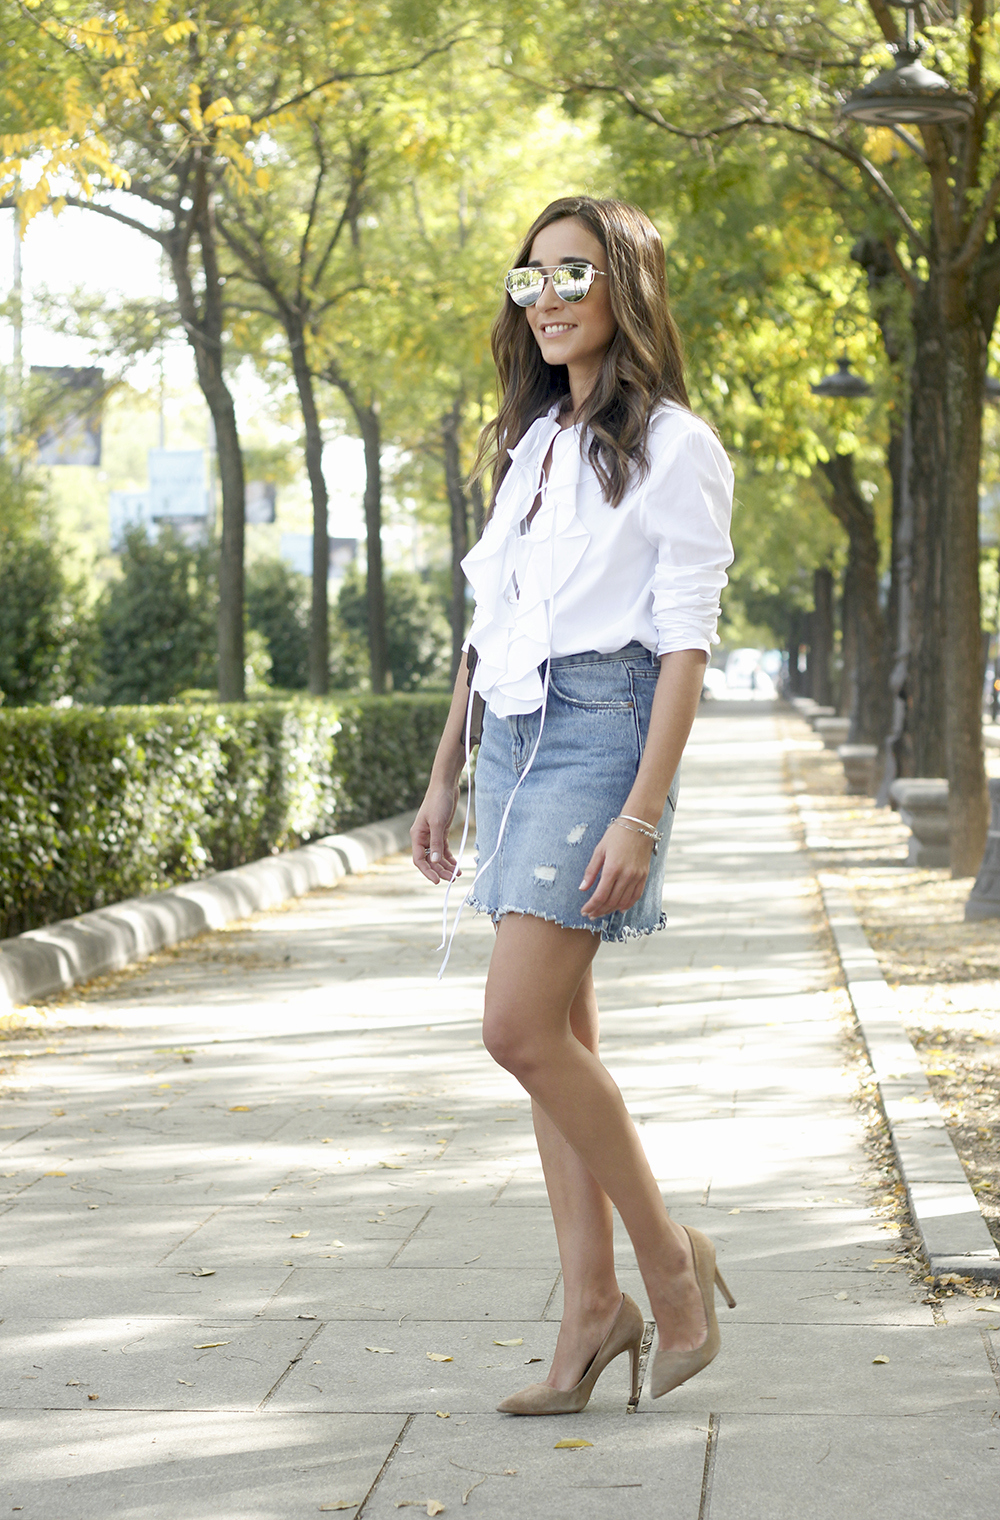 ruffled shirt uterqüe denim shirt sunnies heels gucci bag outfit fashion style03